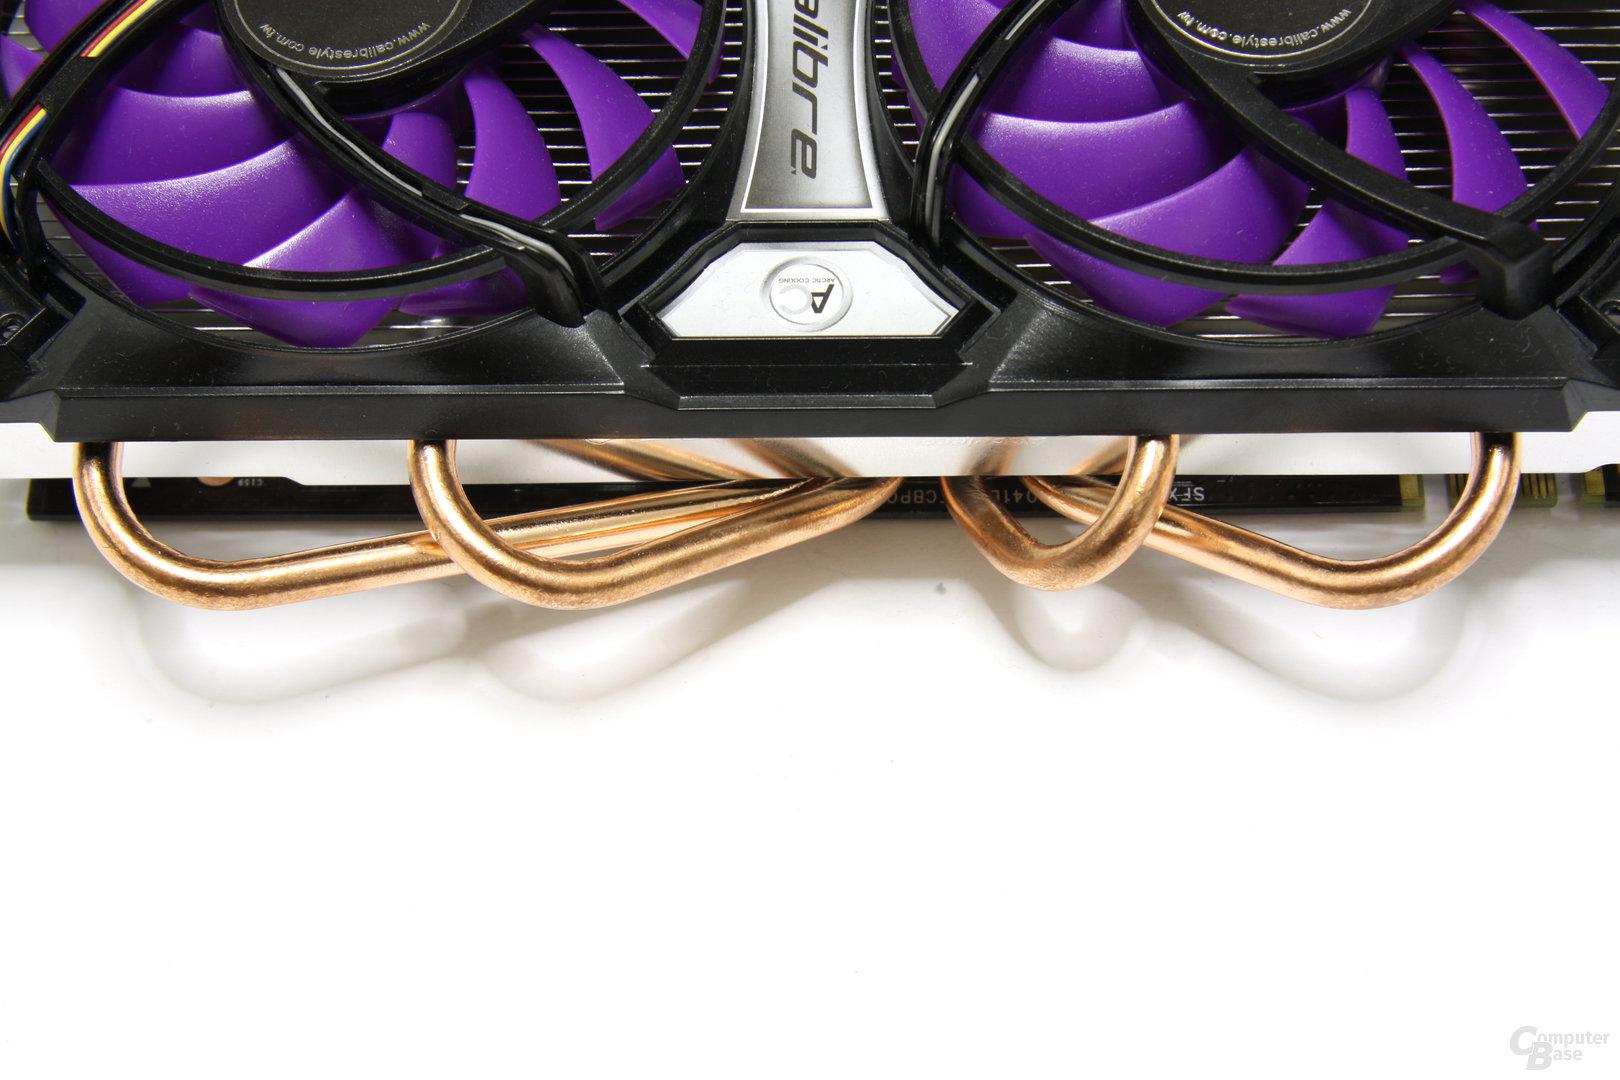 Calibre GTX 460 Heatpipes von oben